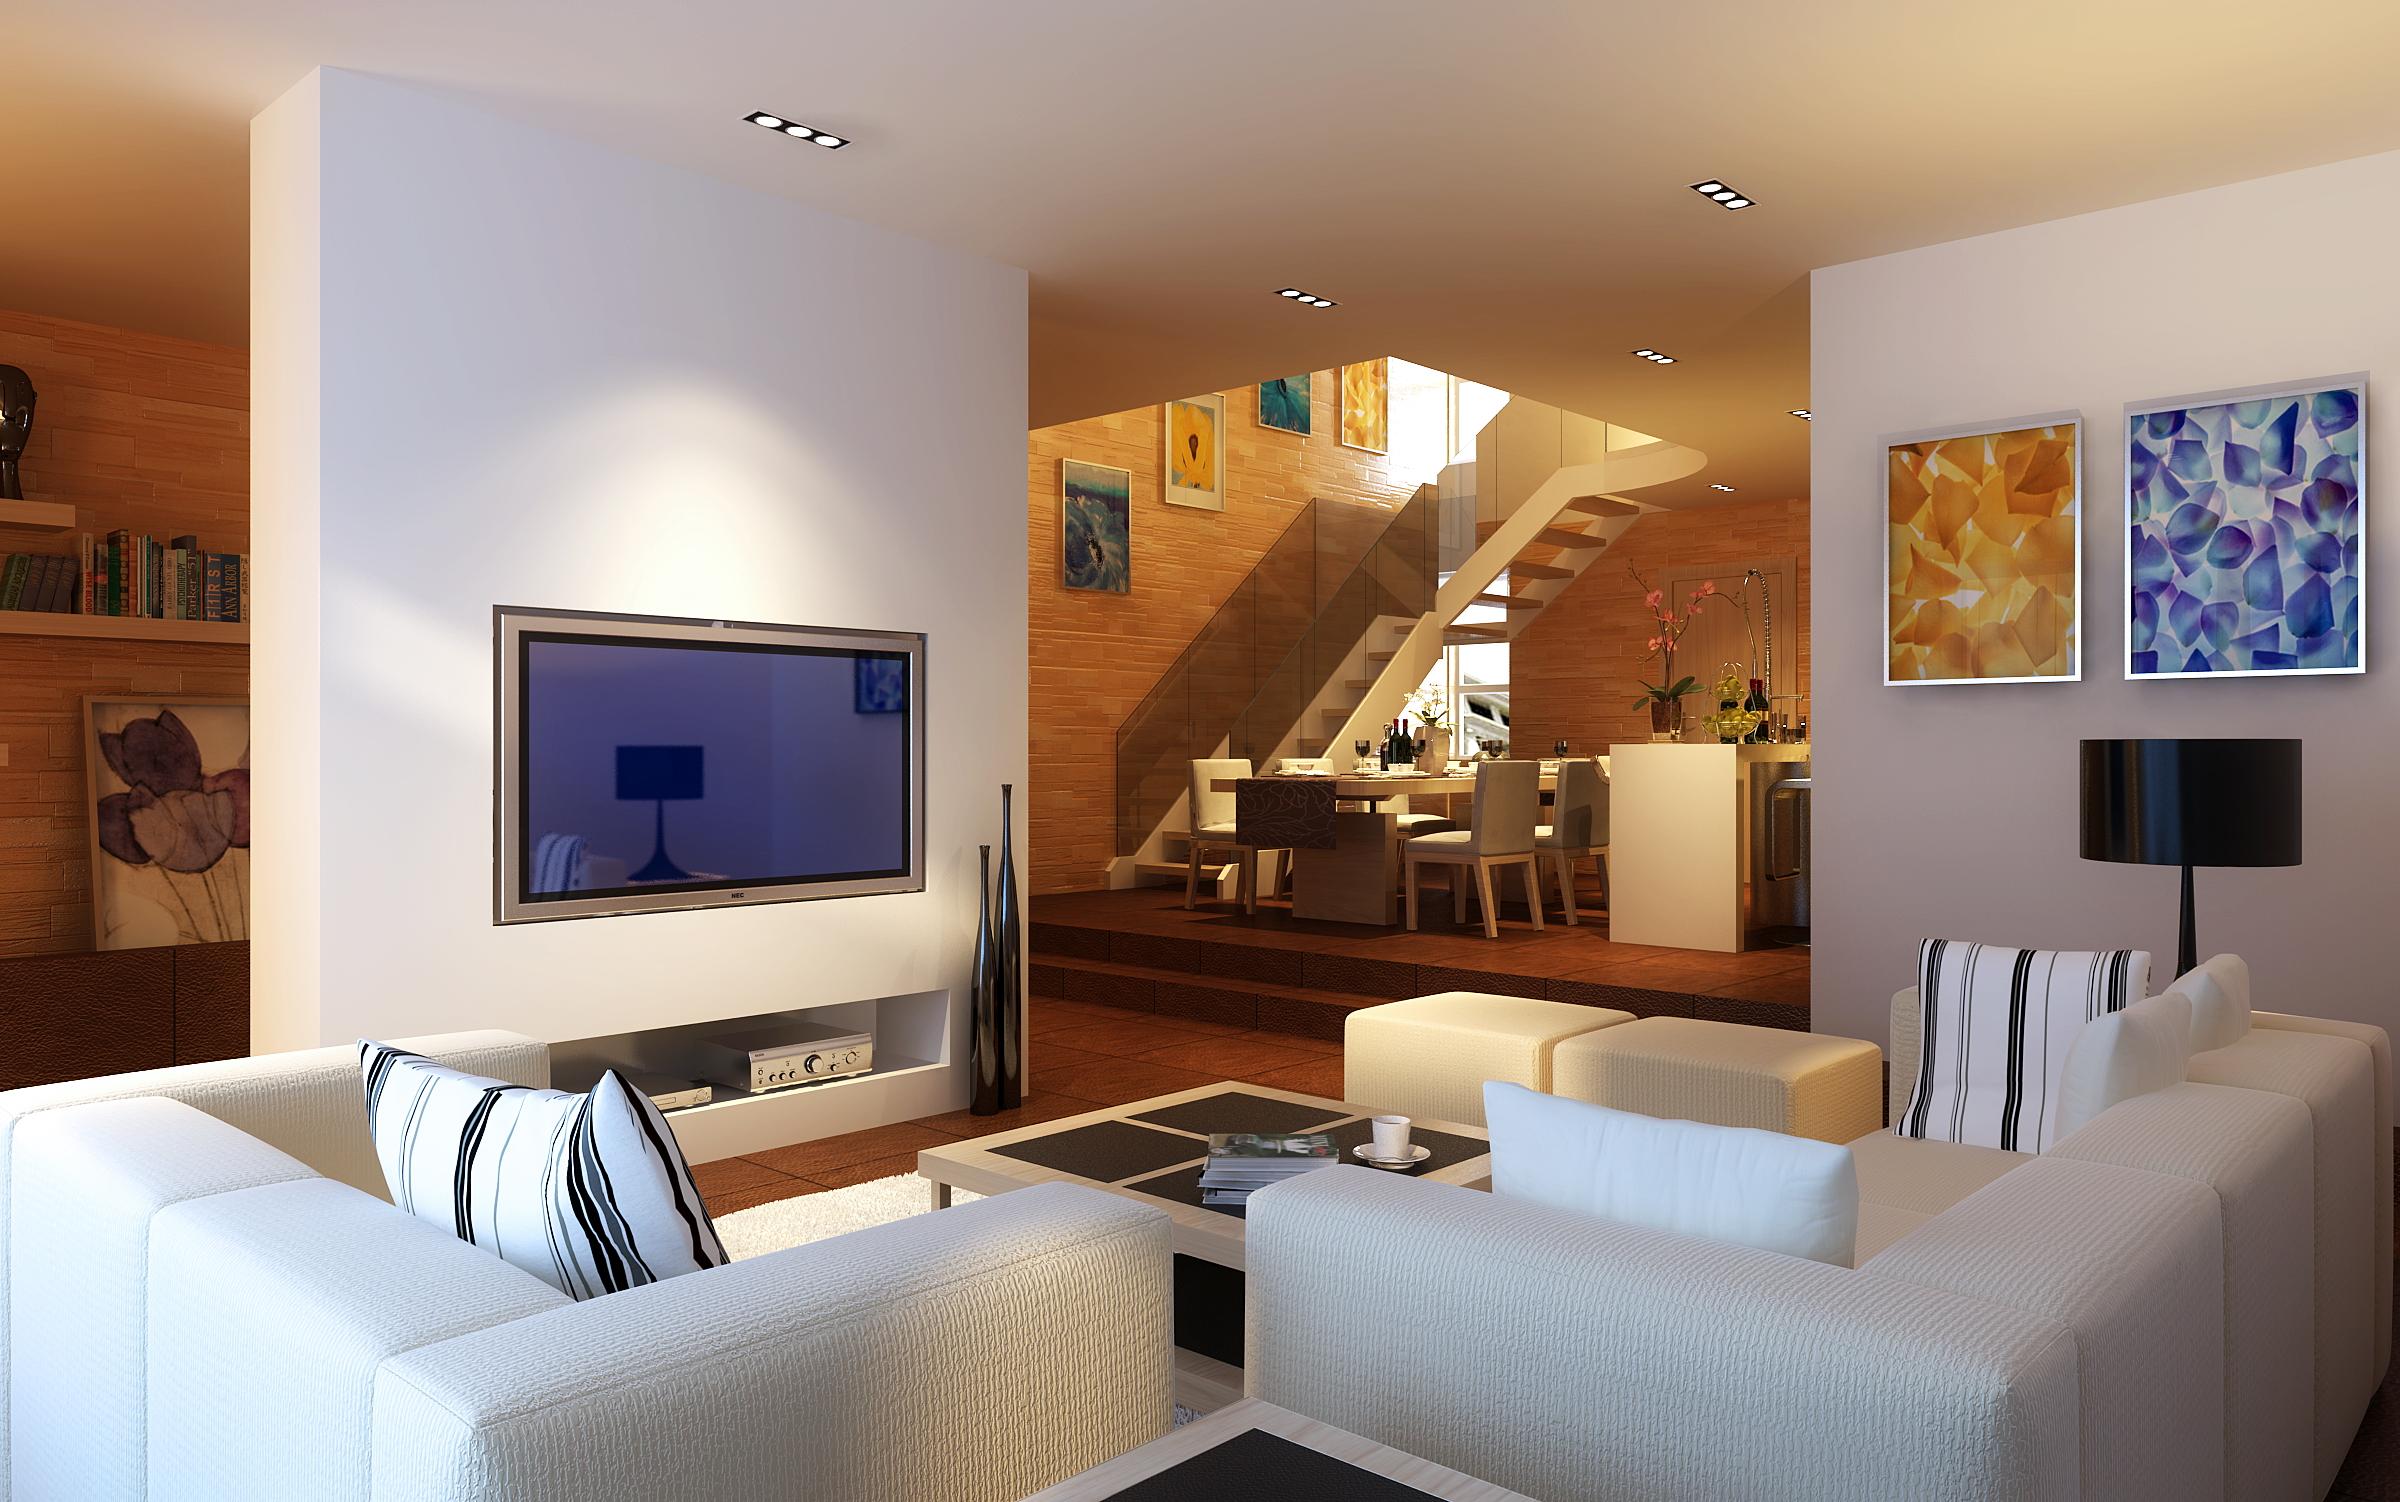 Condo living room 360 3d model for Room design 360